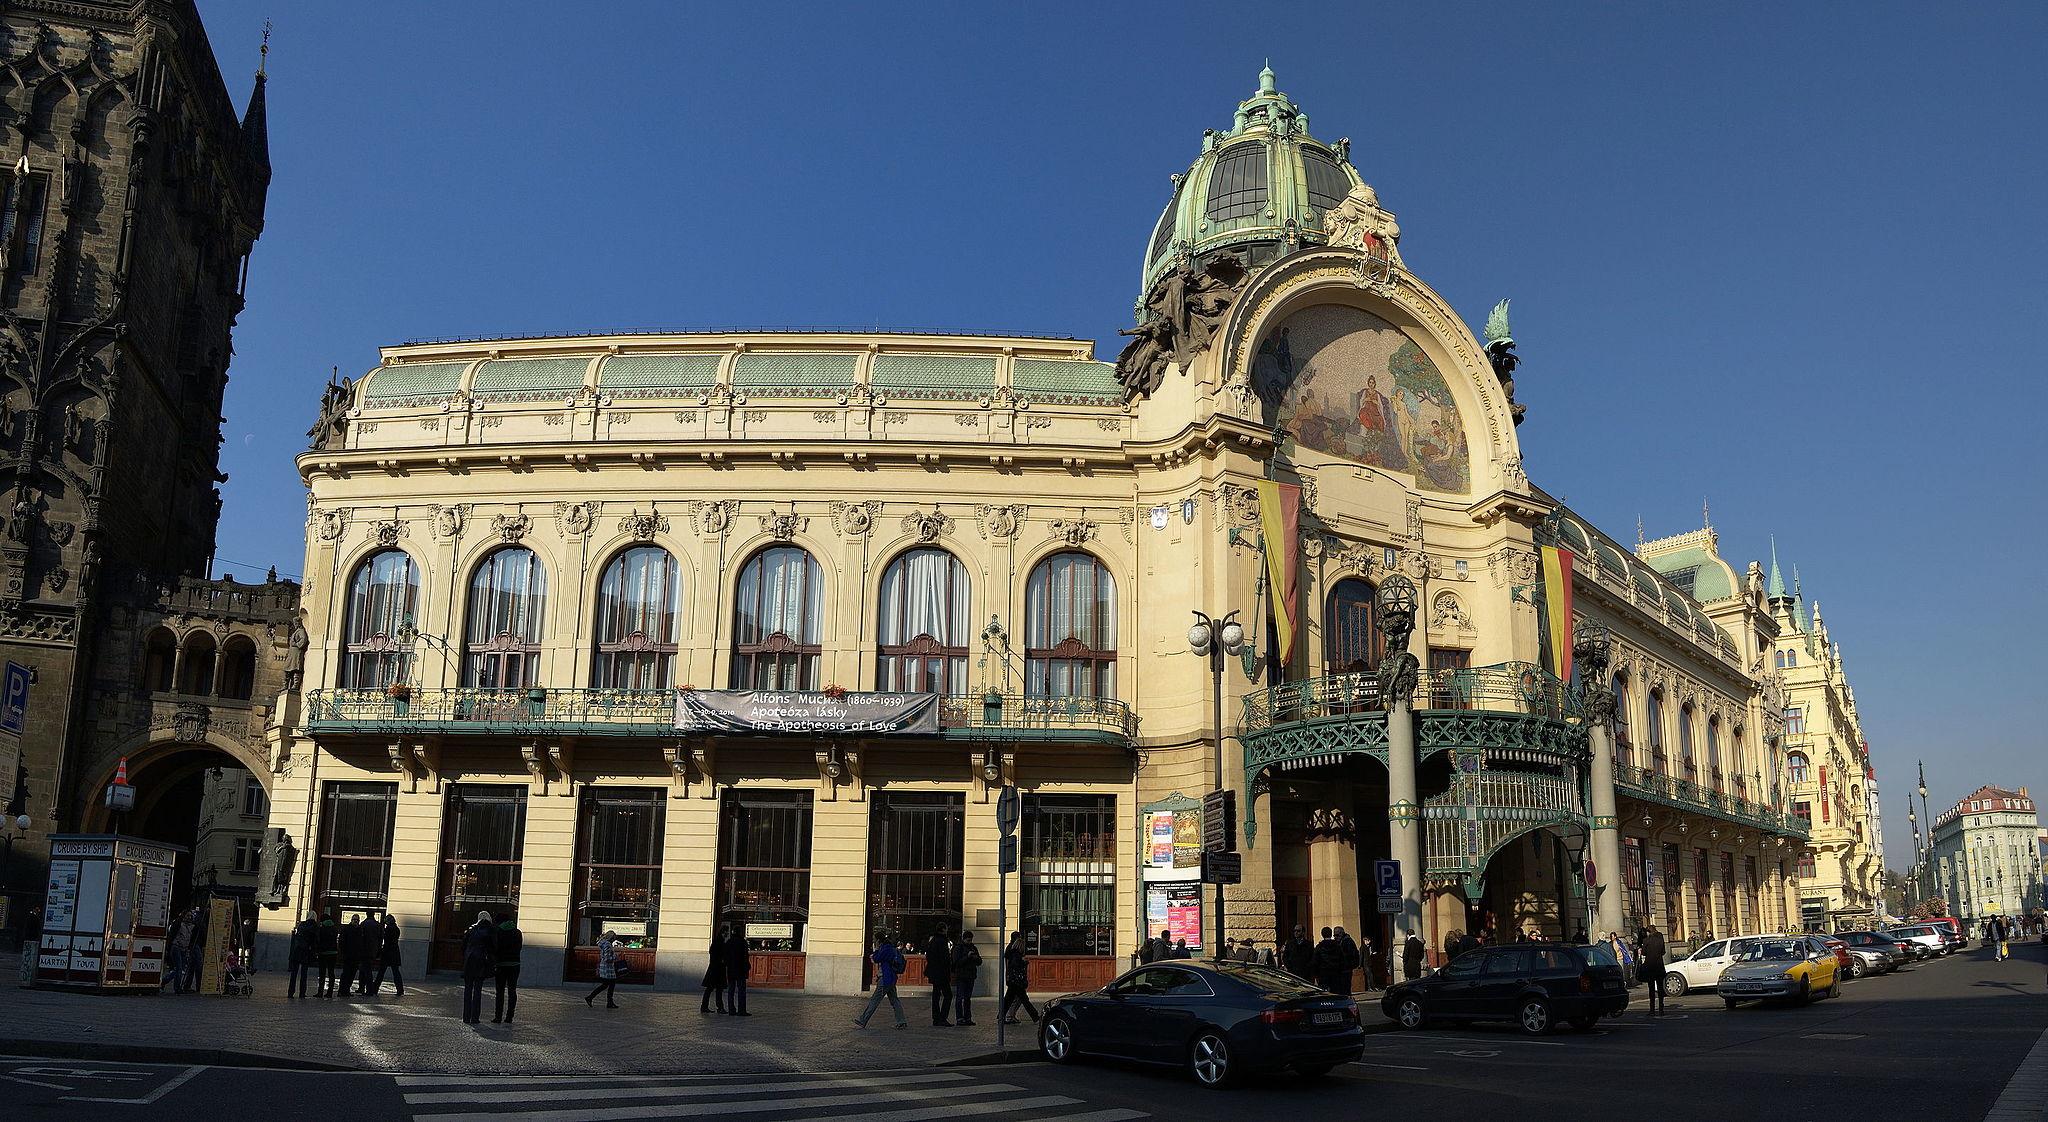 Praga Obecni Dum